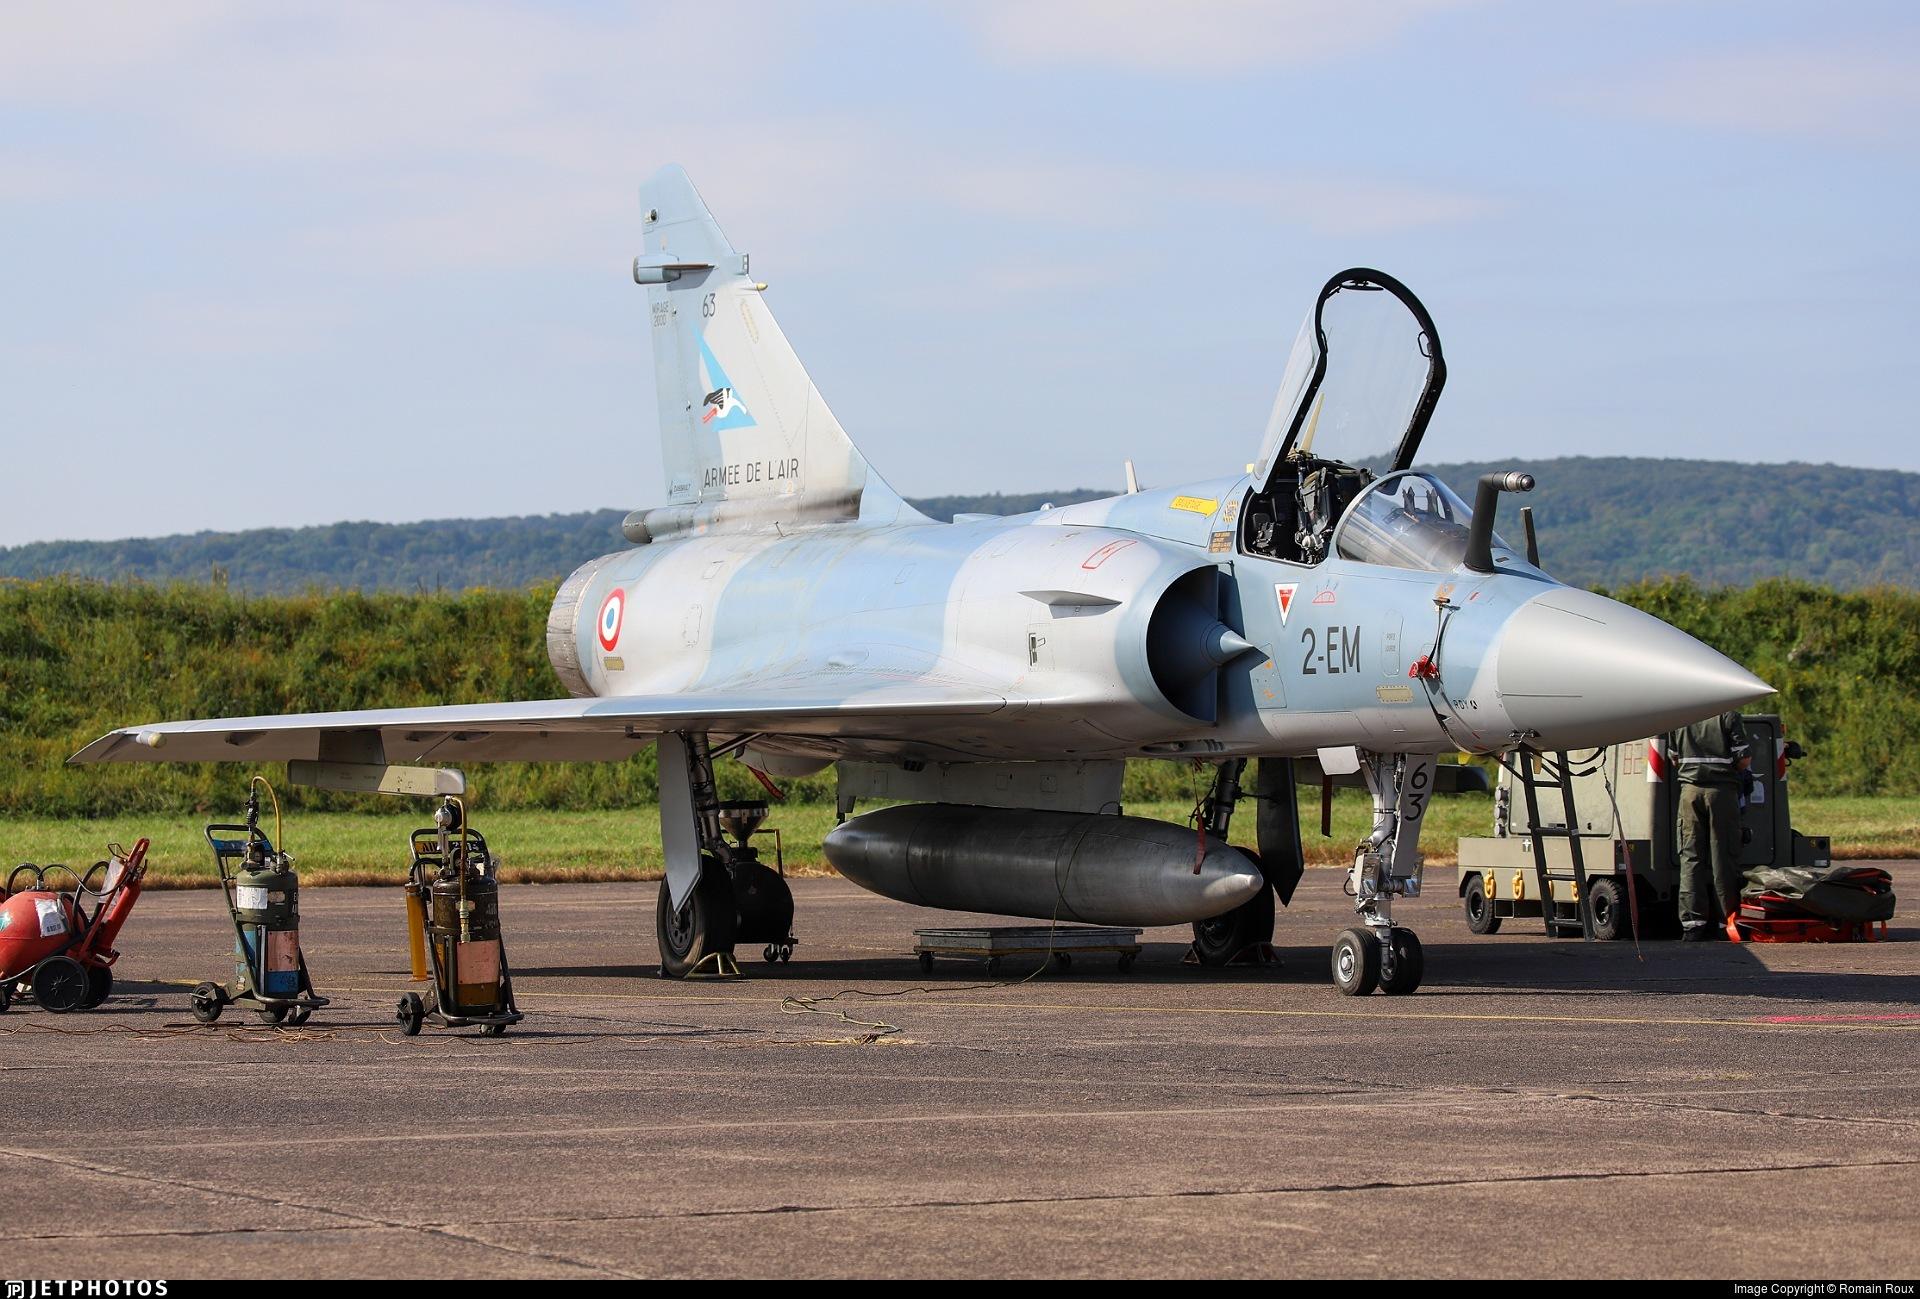 63 - Dassault Mirage 2000-5F - France - Air Force